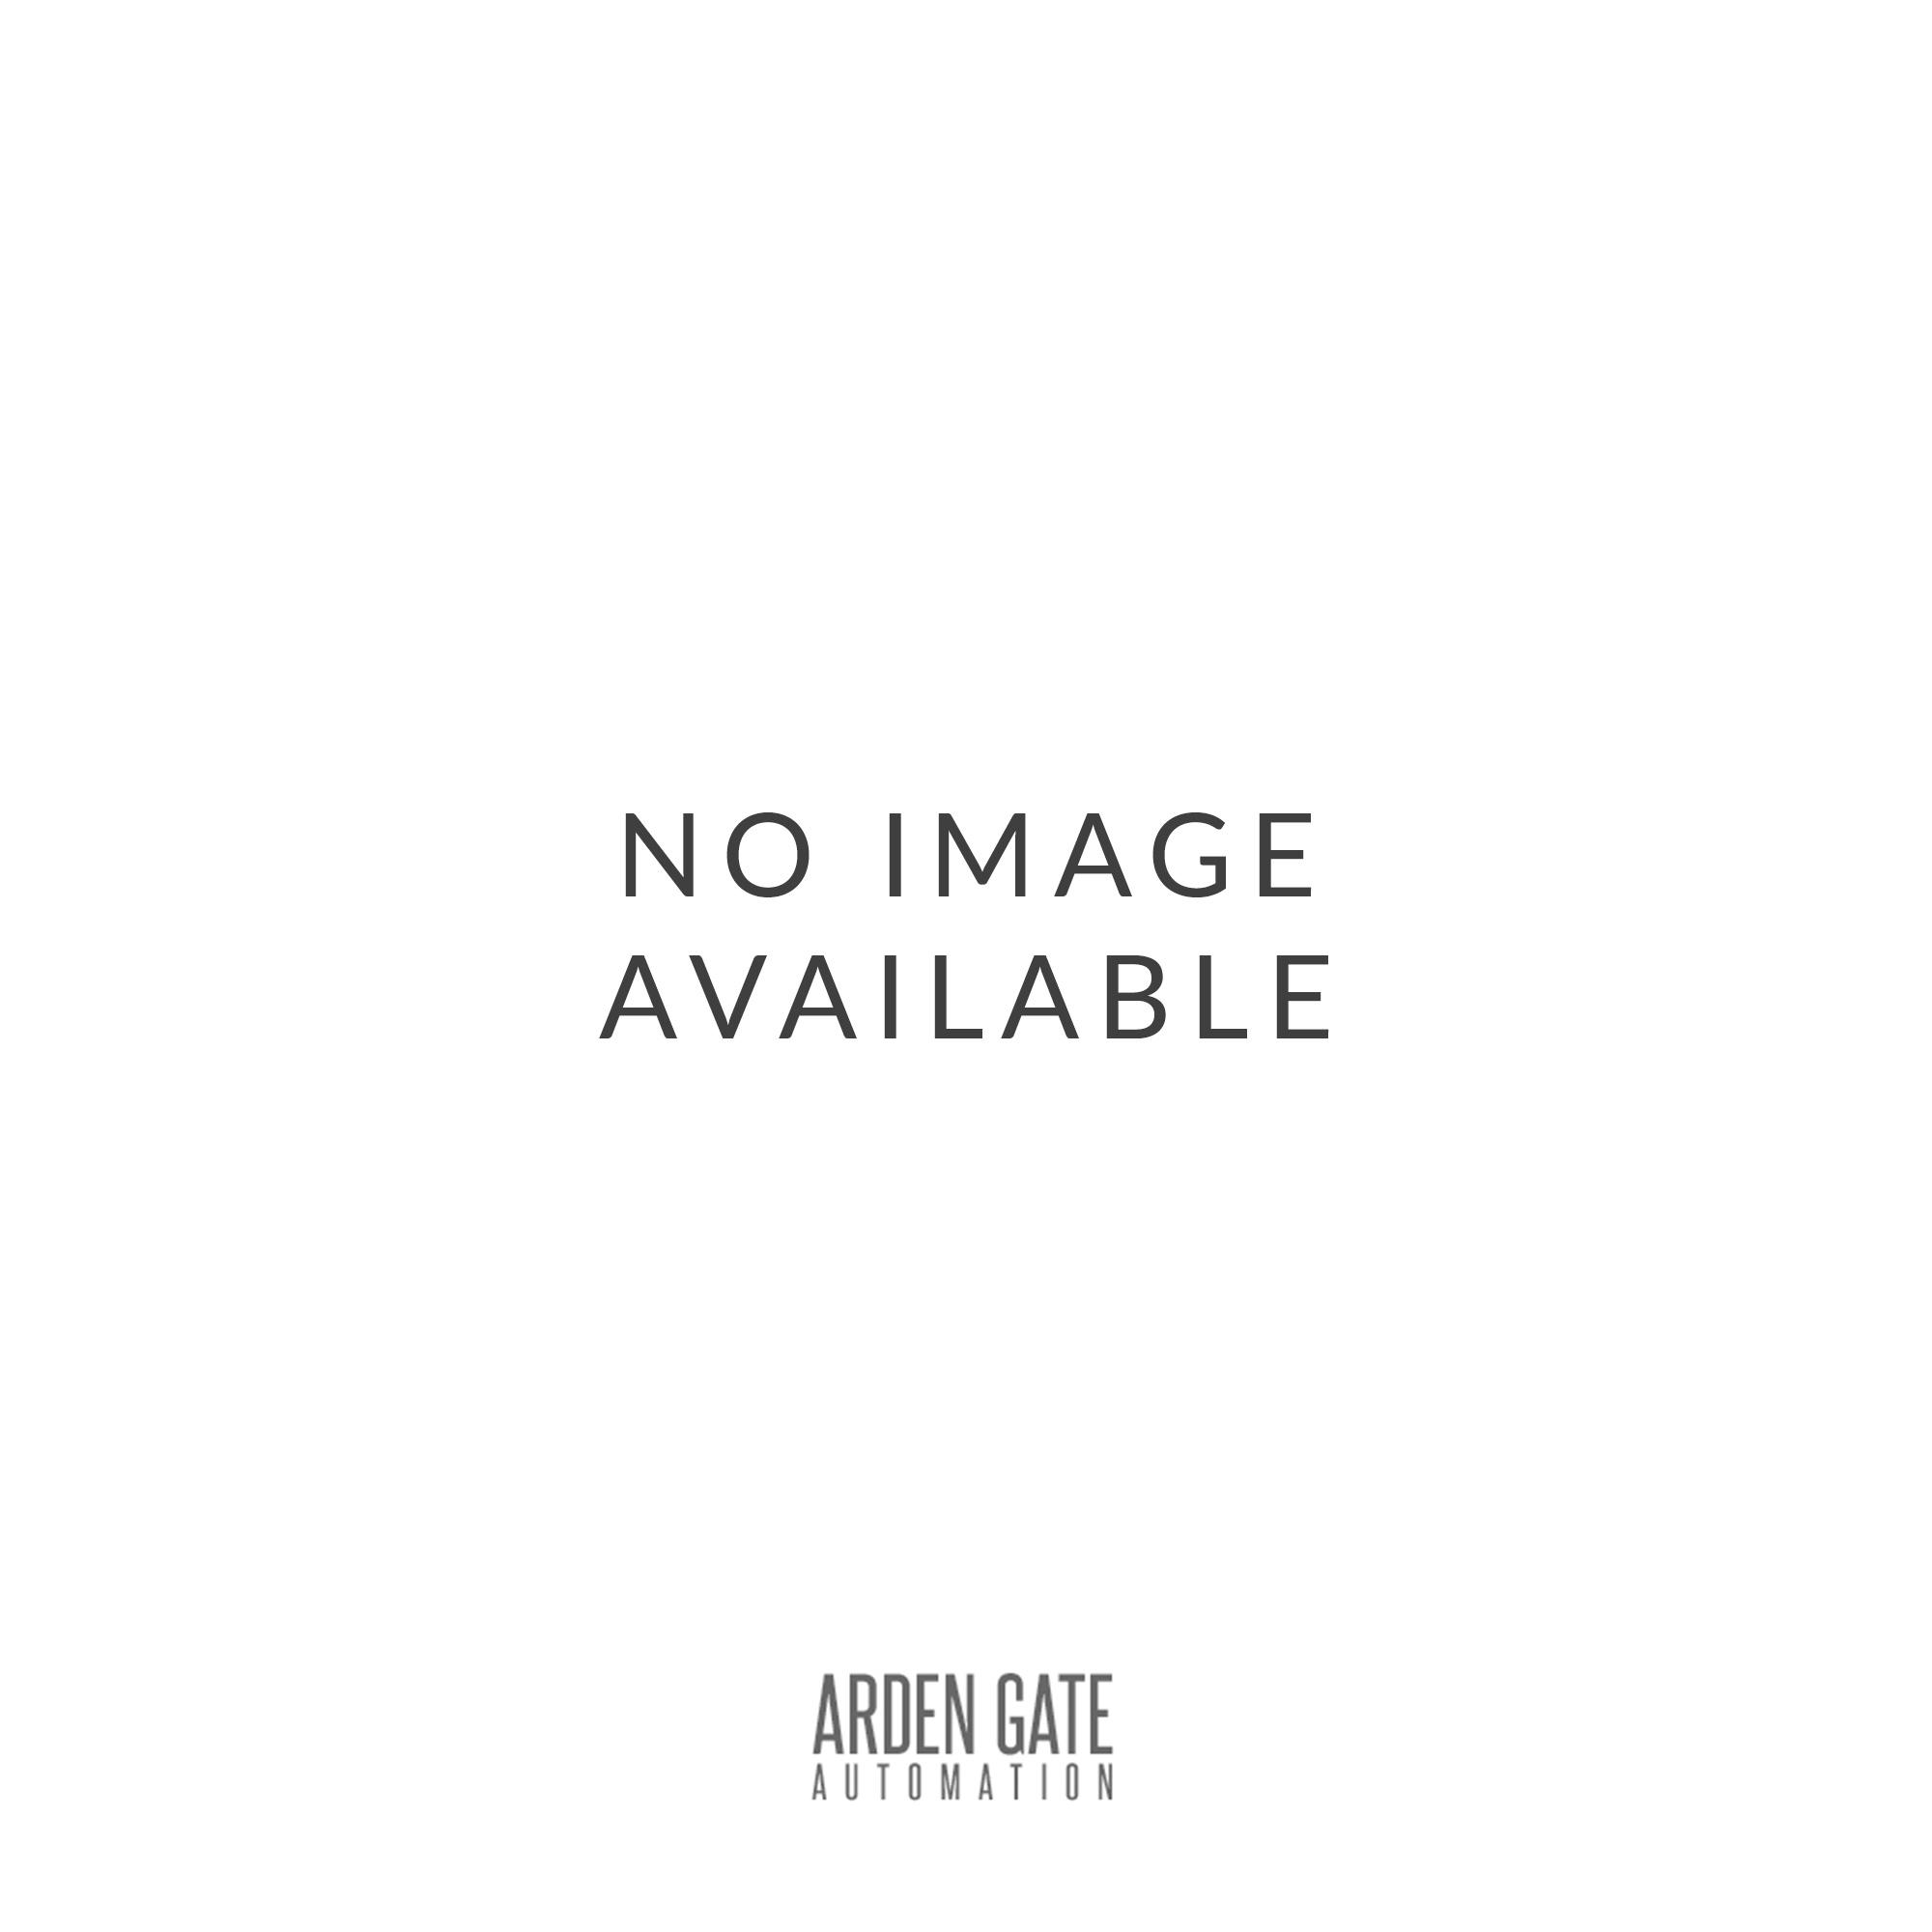 FAAC 415 24v KIT S electro mechanical operator single kit for swing gates